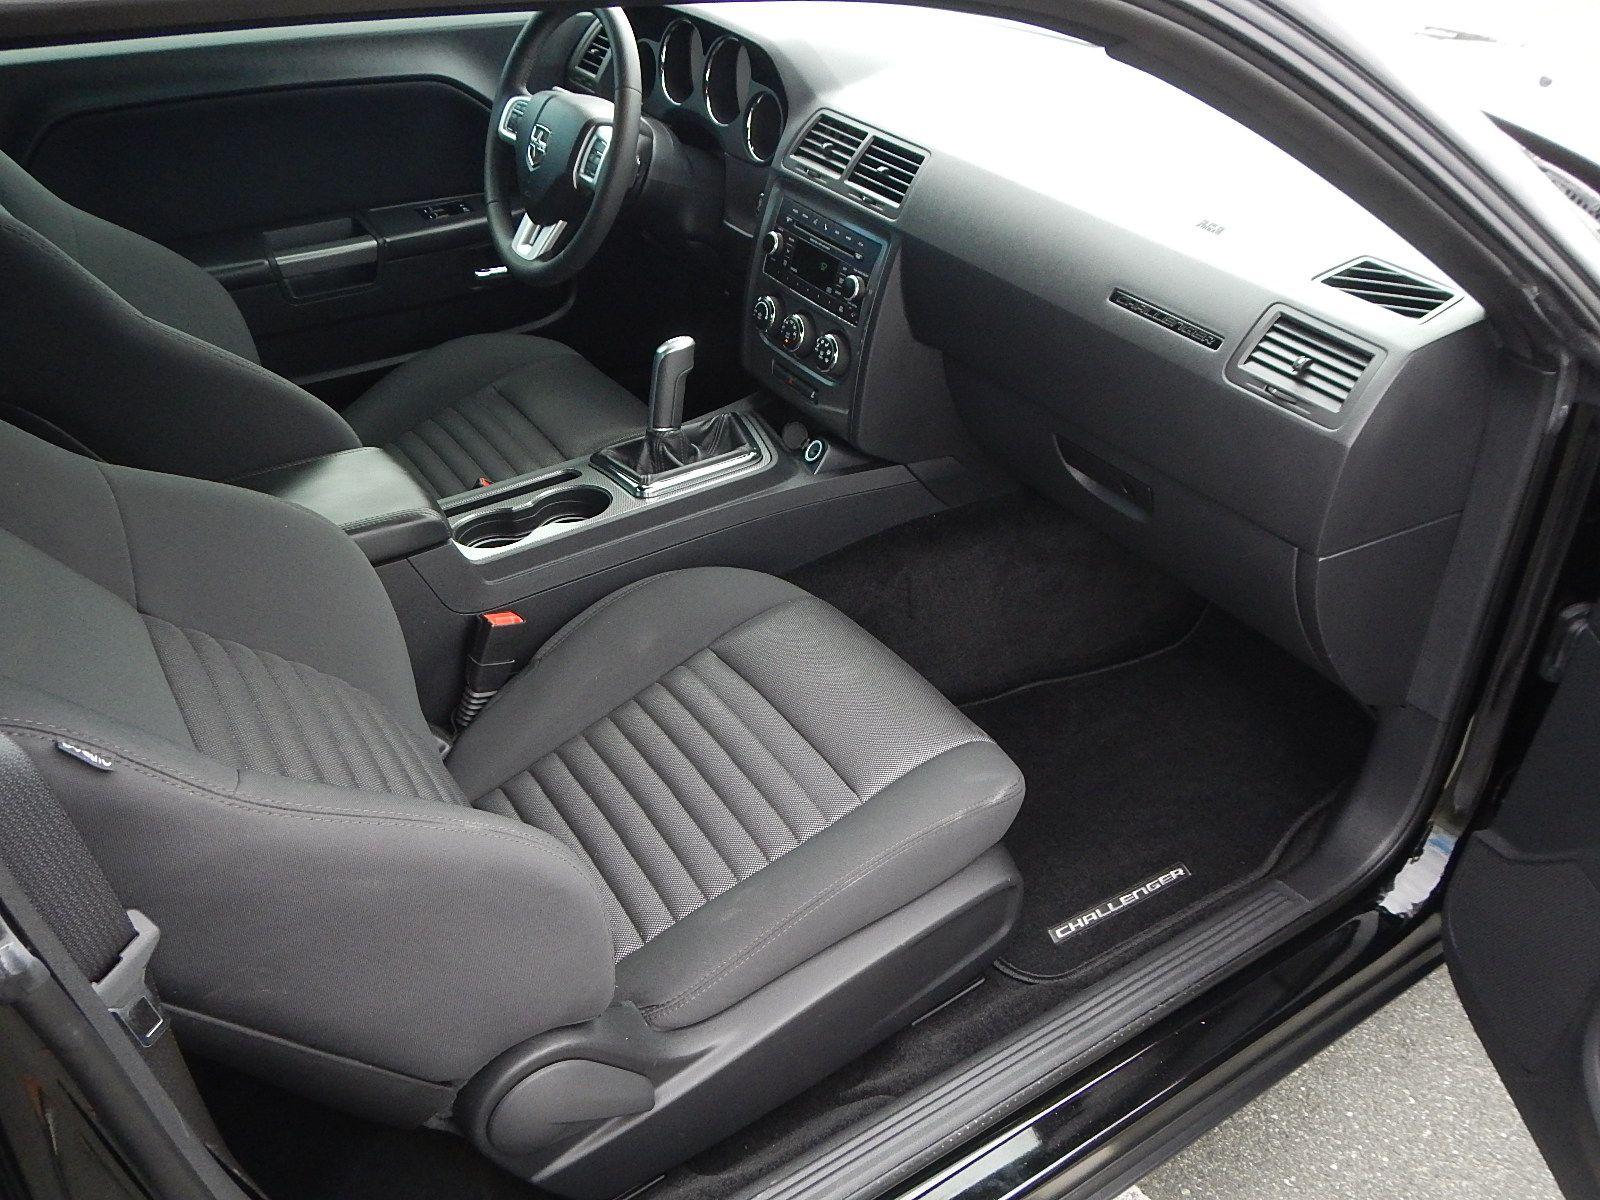 2013 Dodge Challenger 073.jpg